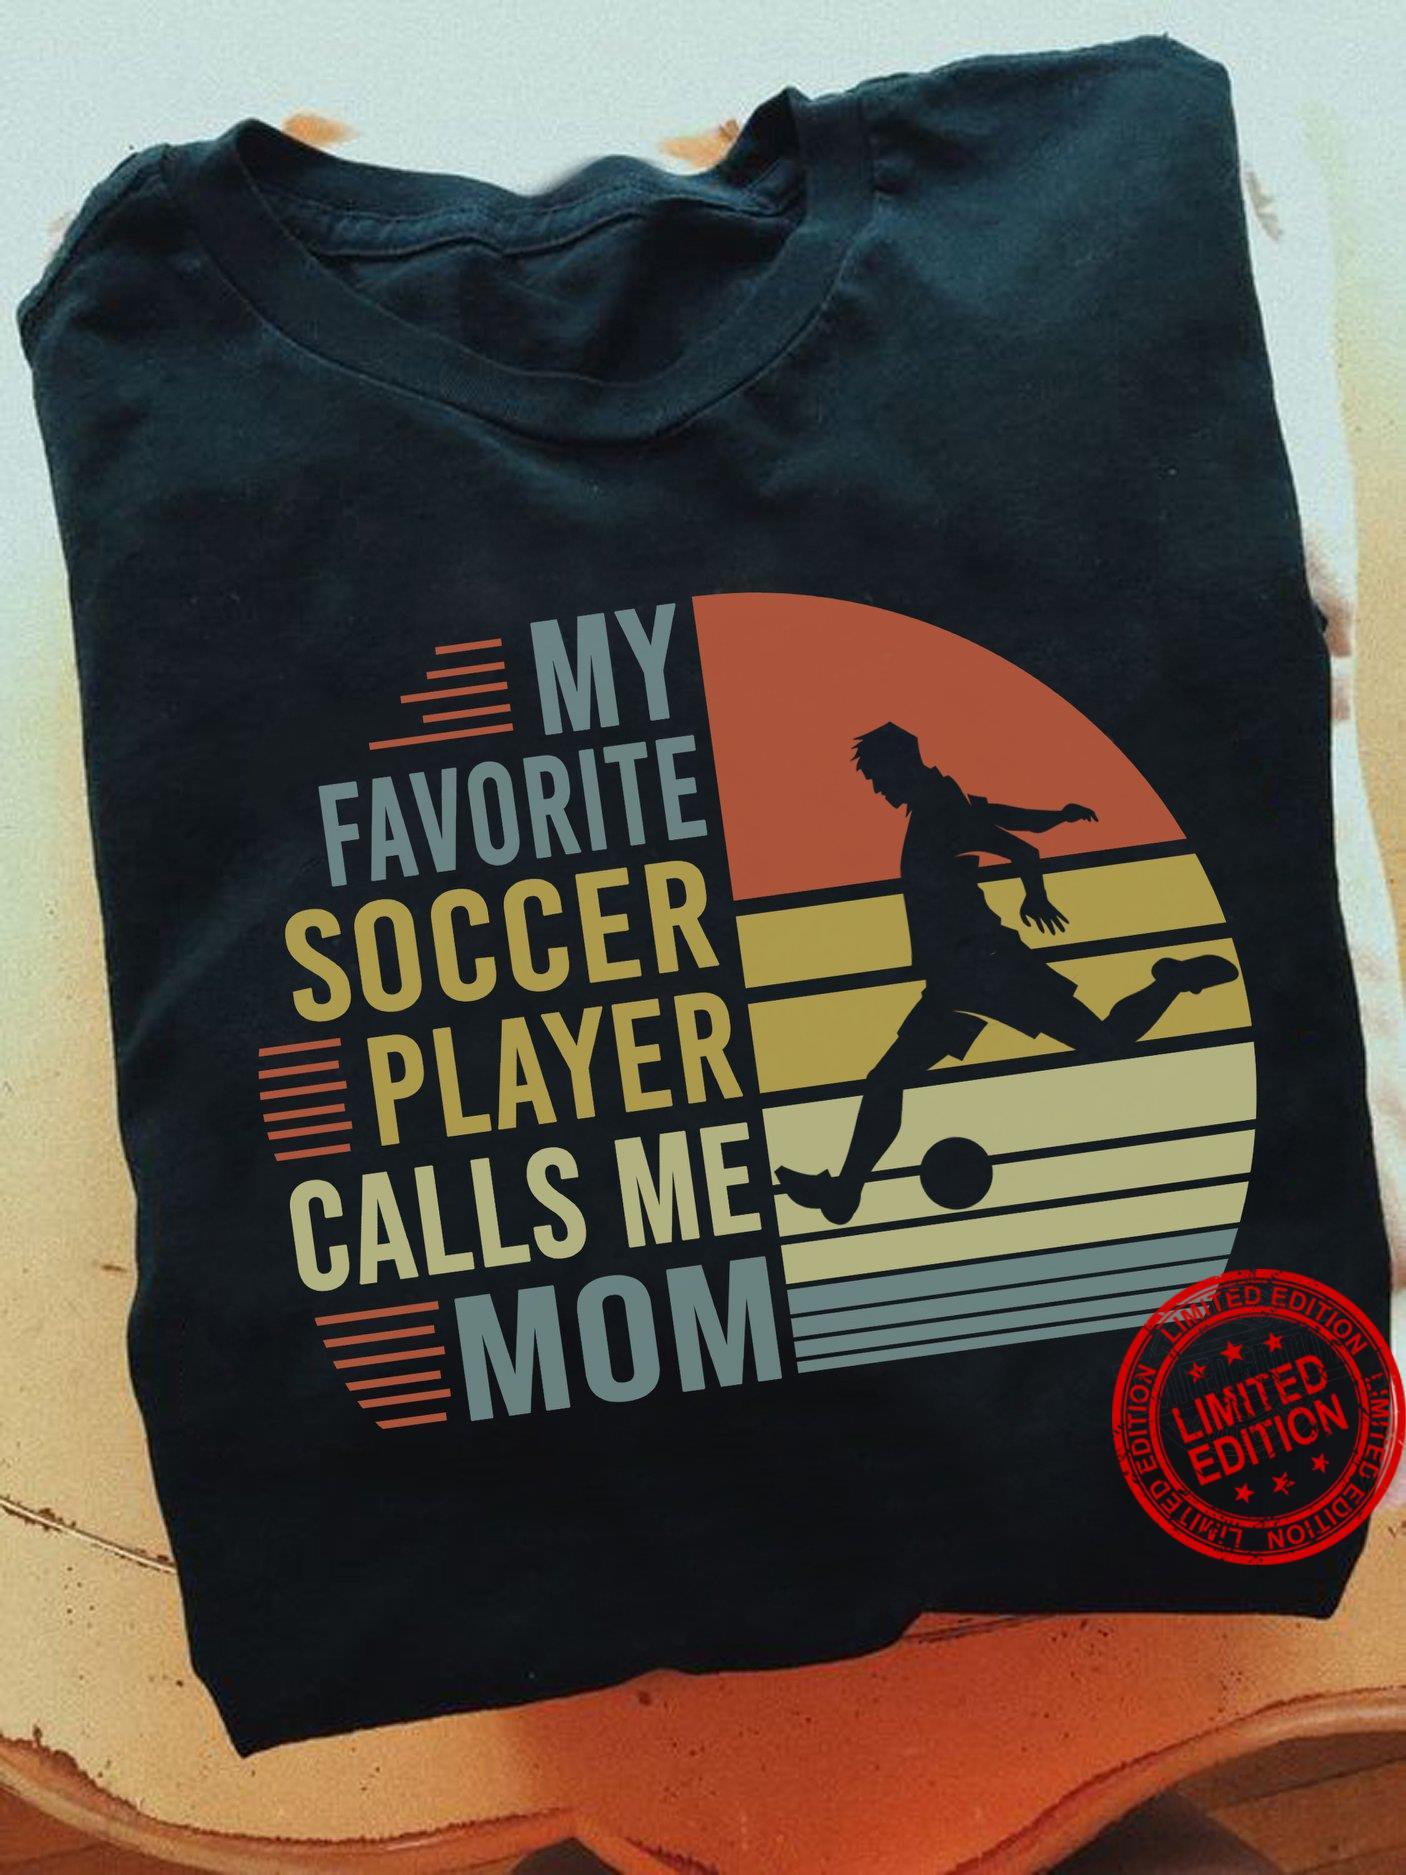 My Favorite Soccer Player Calls Me Mom Shirt